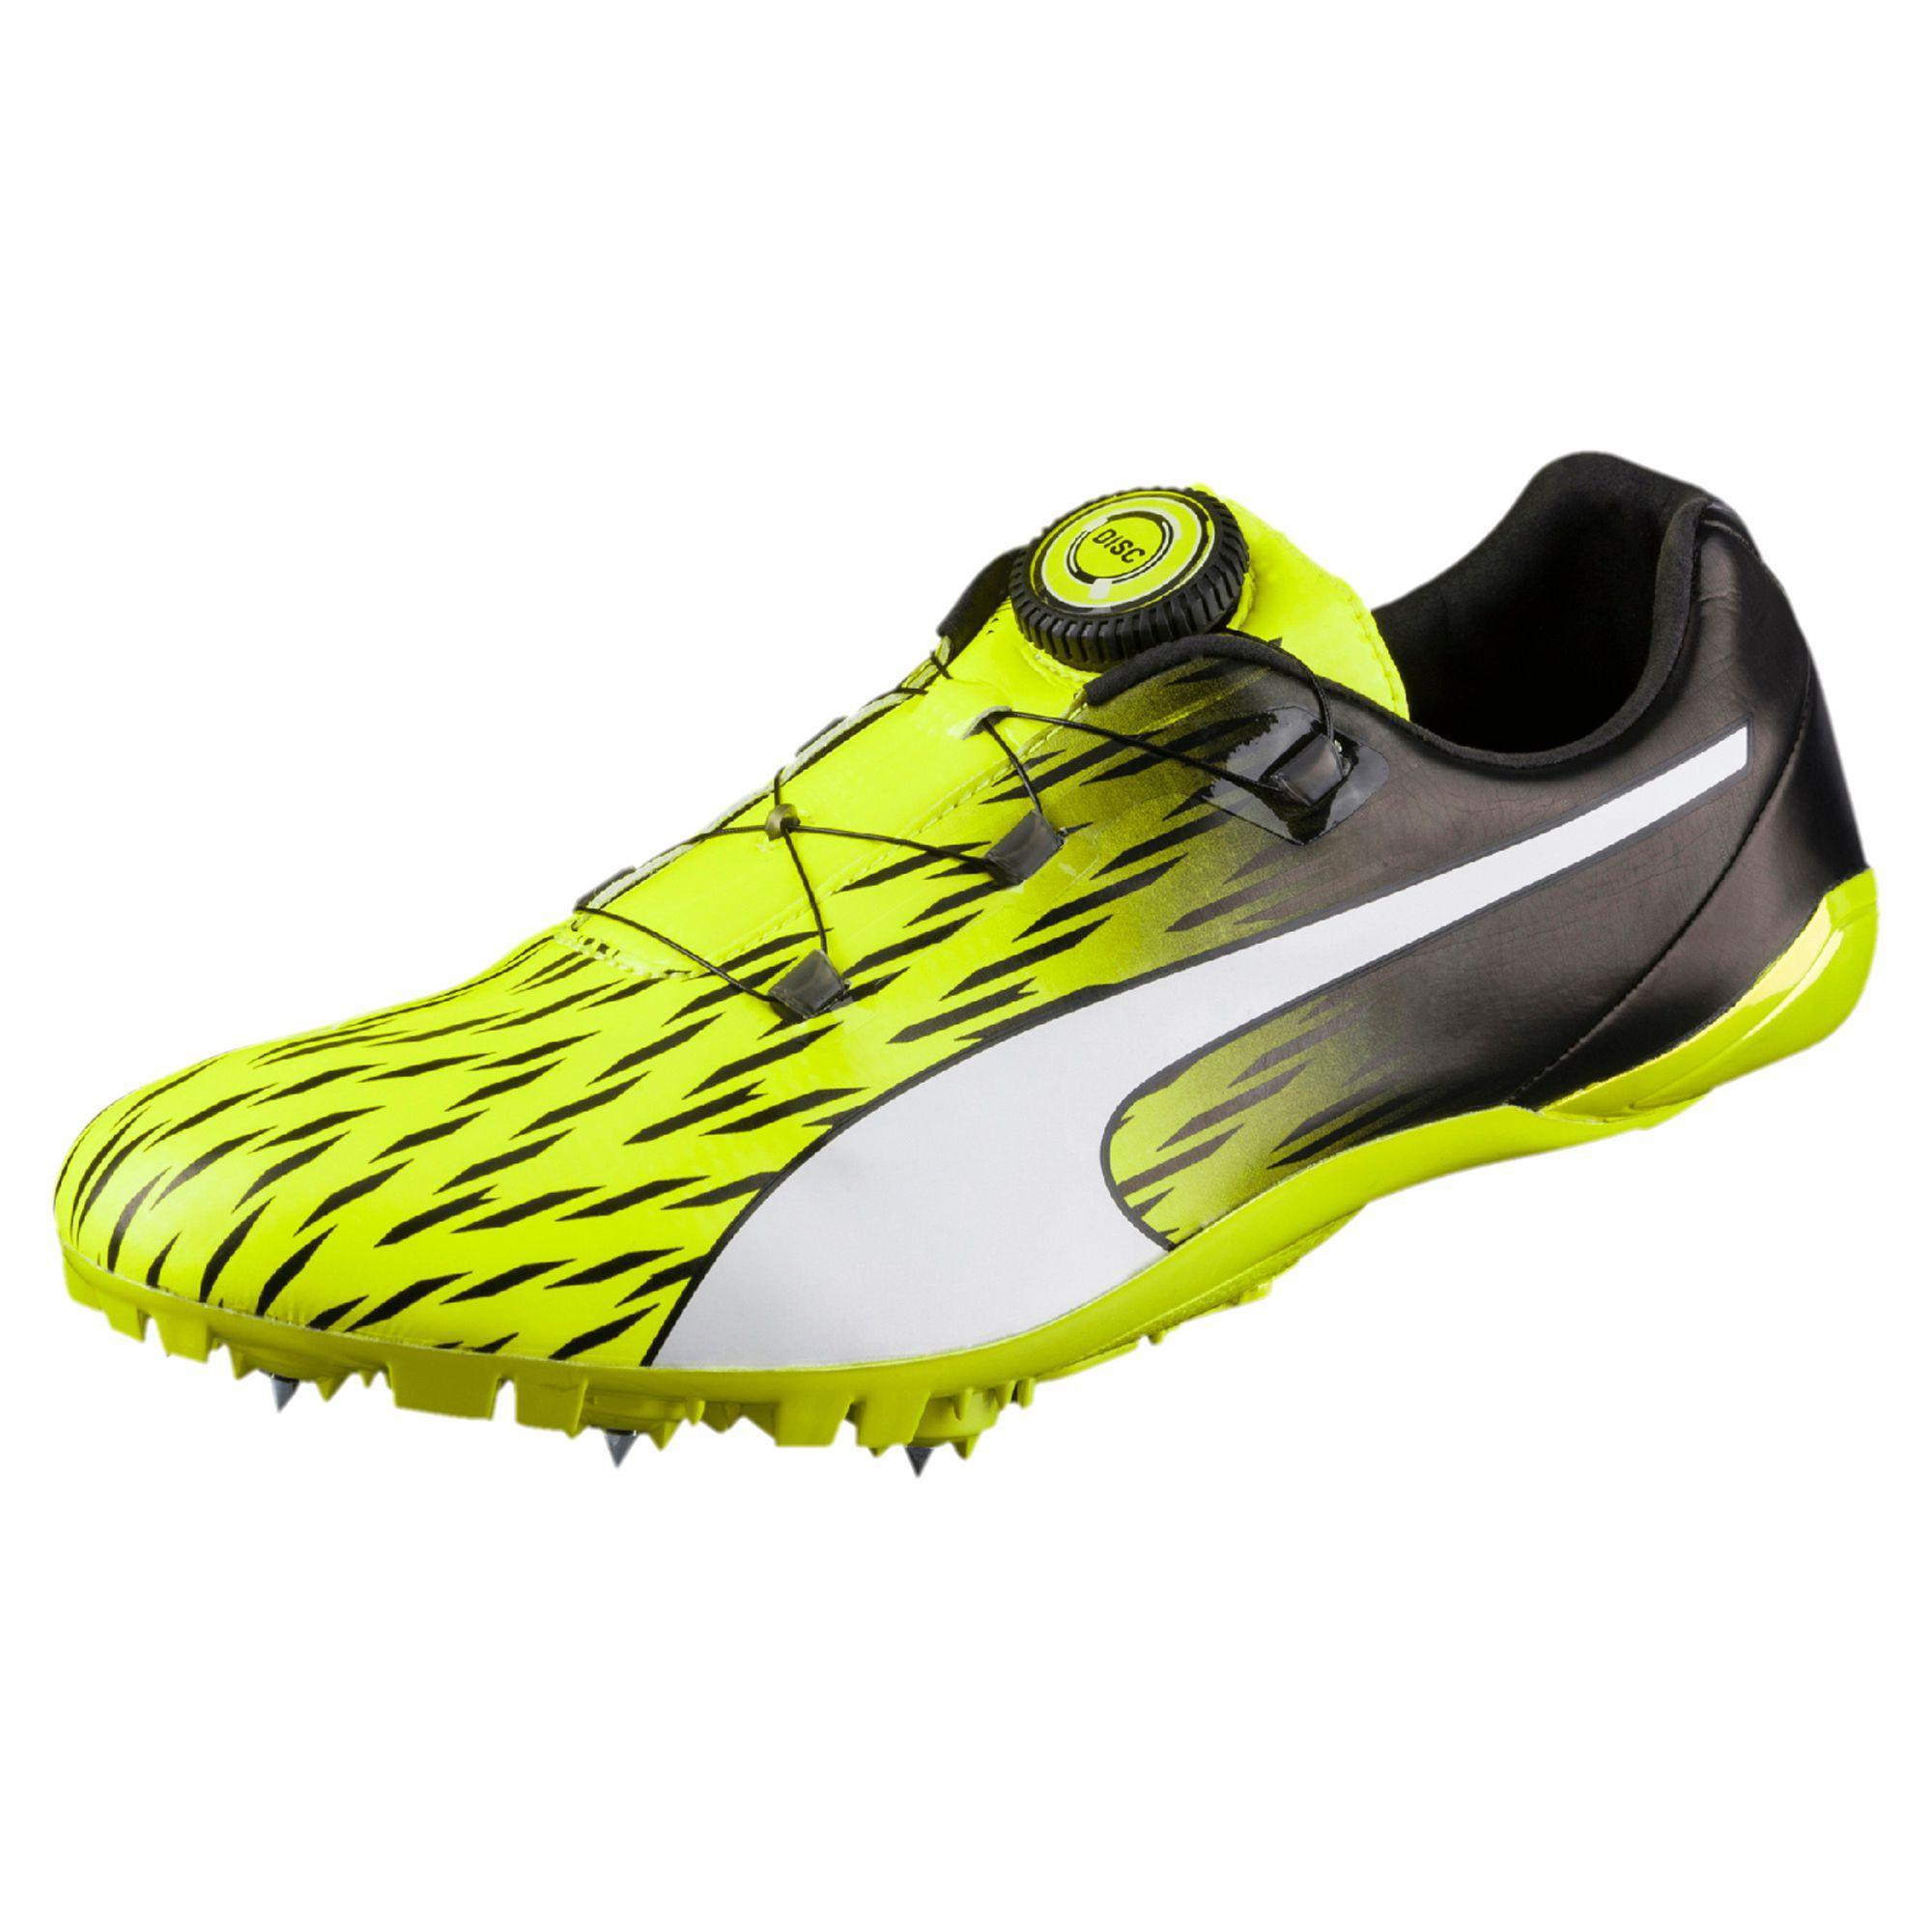 evoSPEED 3 ДИСКА обувь